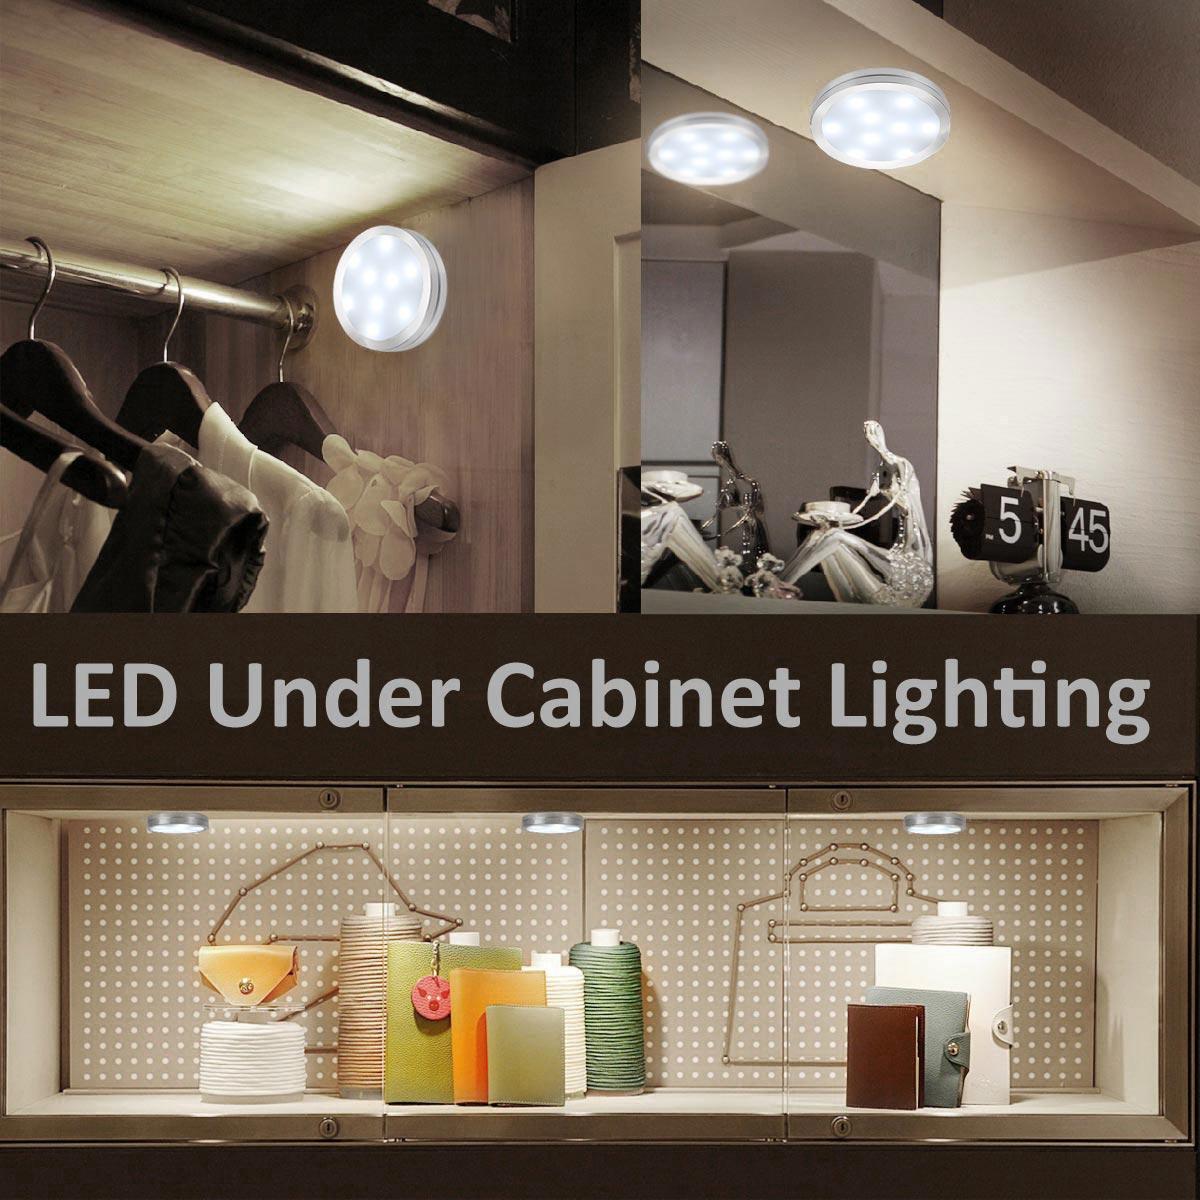 Under Cabinet Lighting - Walmart.com